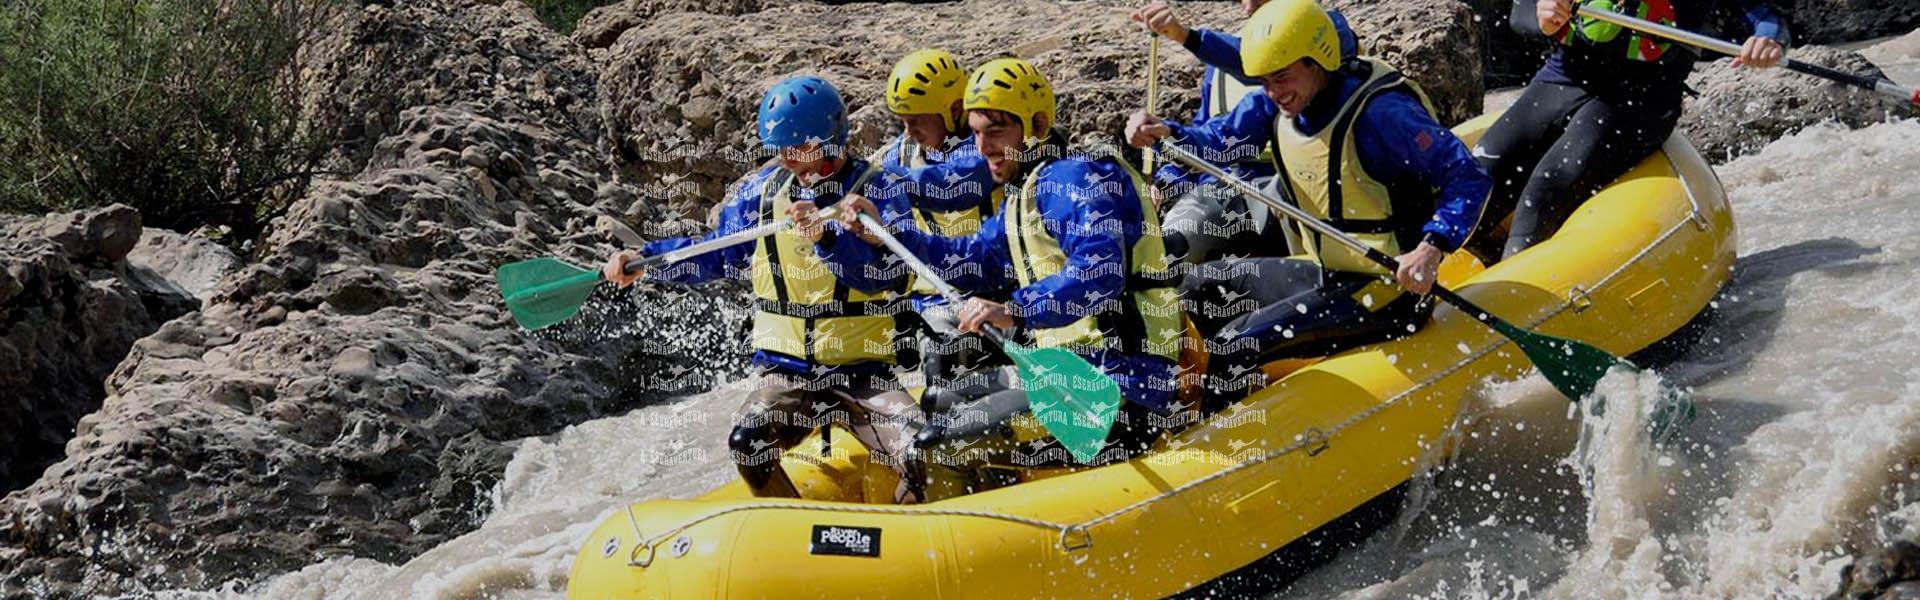 Rafting Exclusivo Grupos